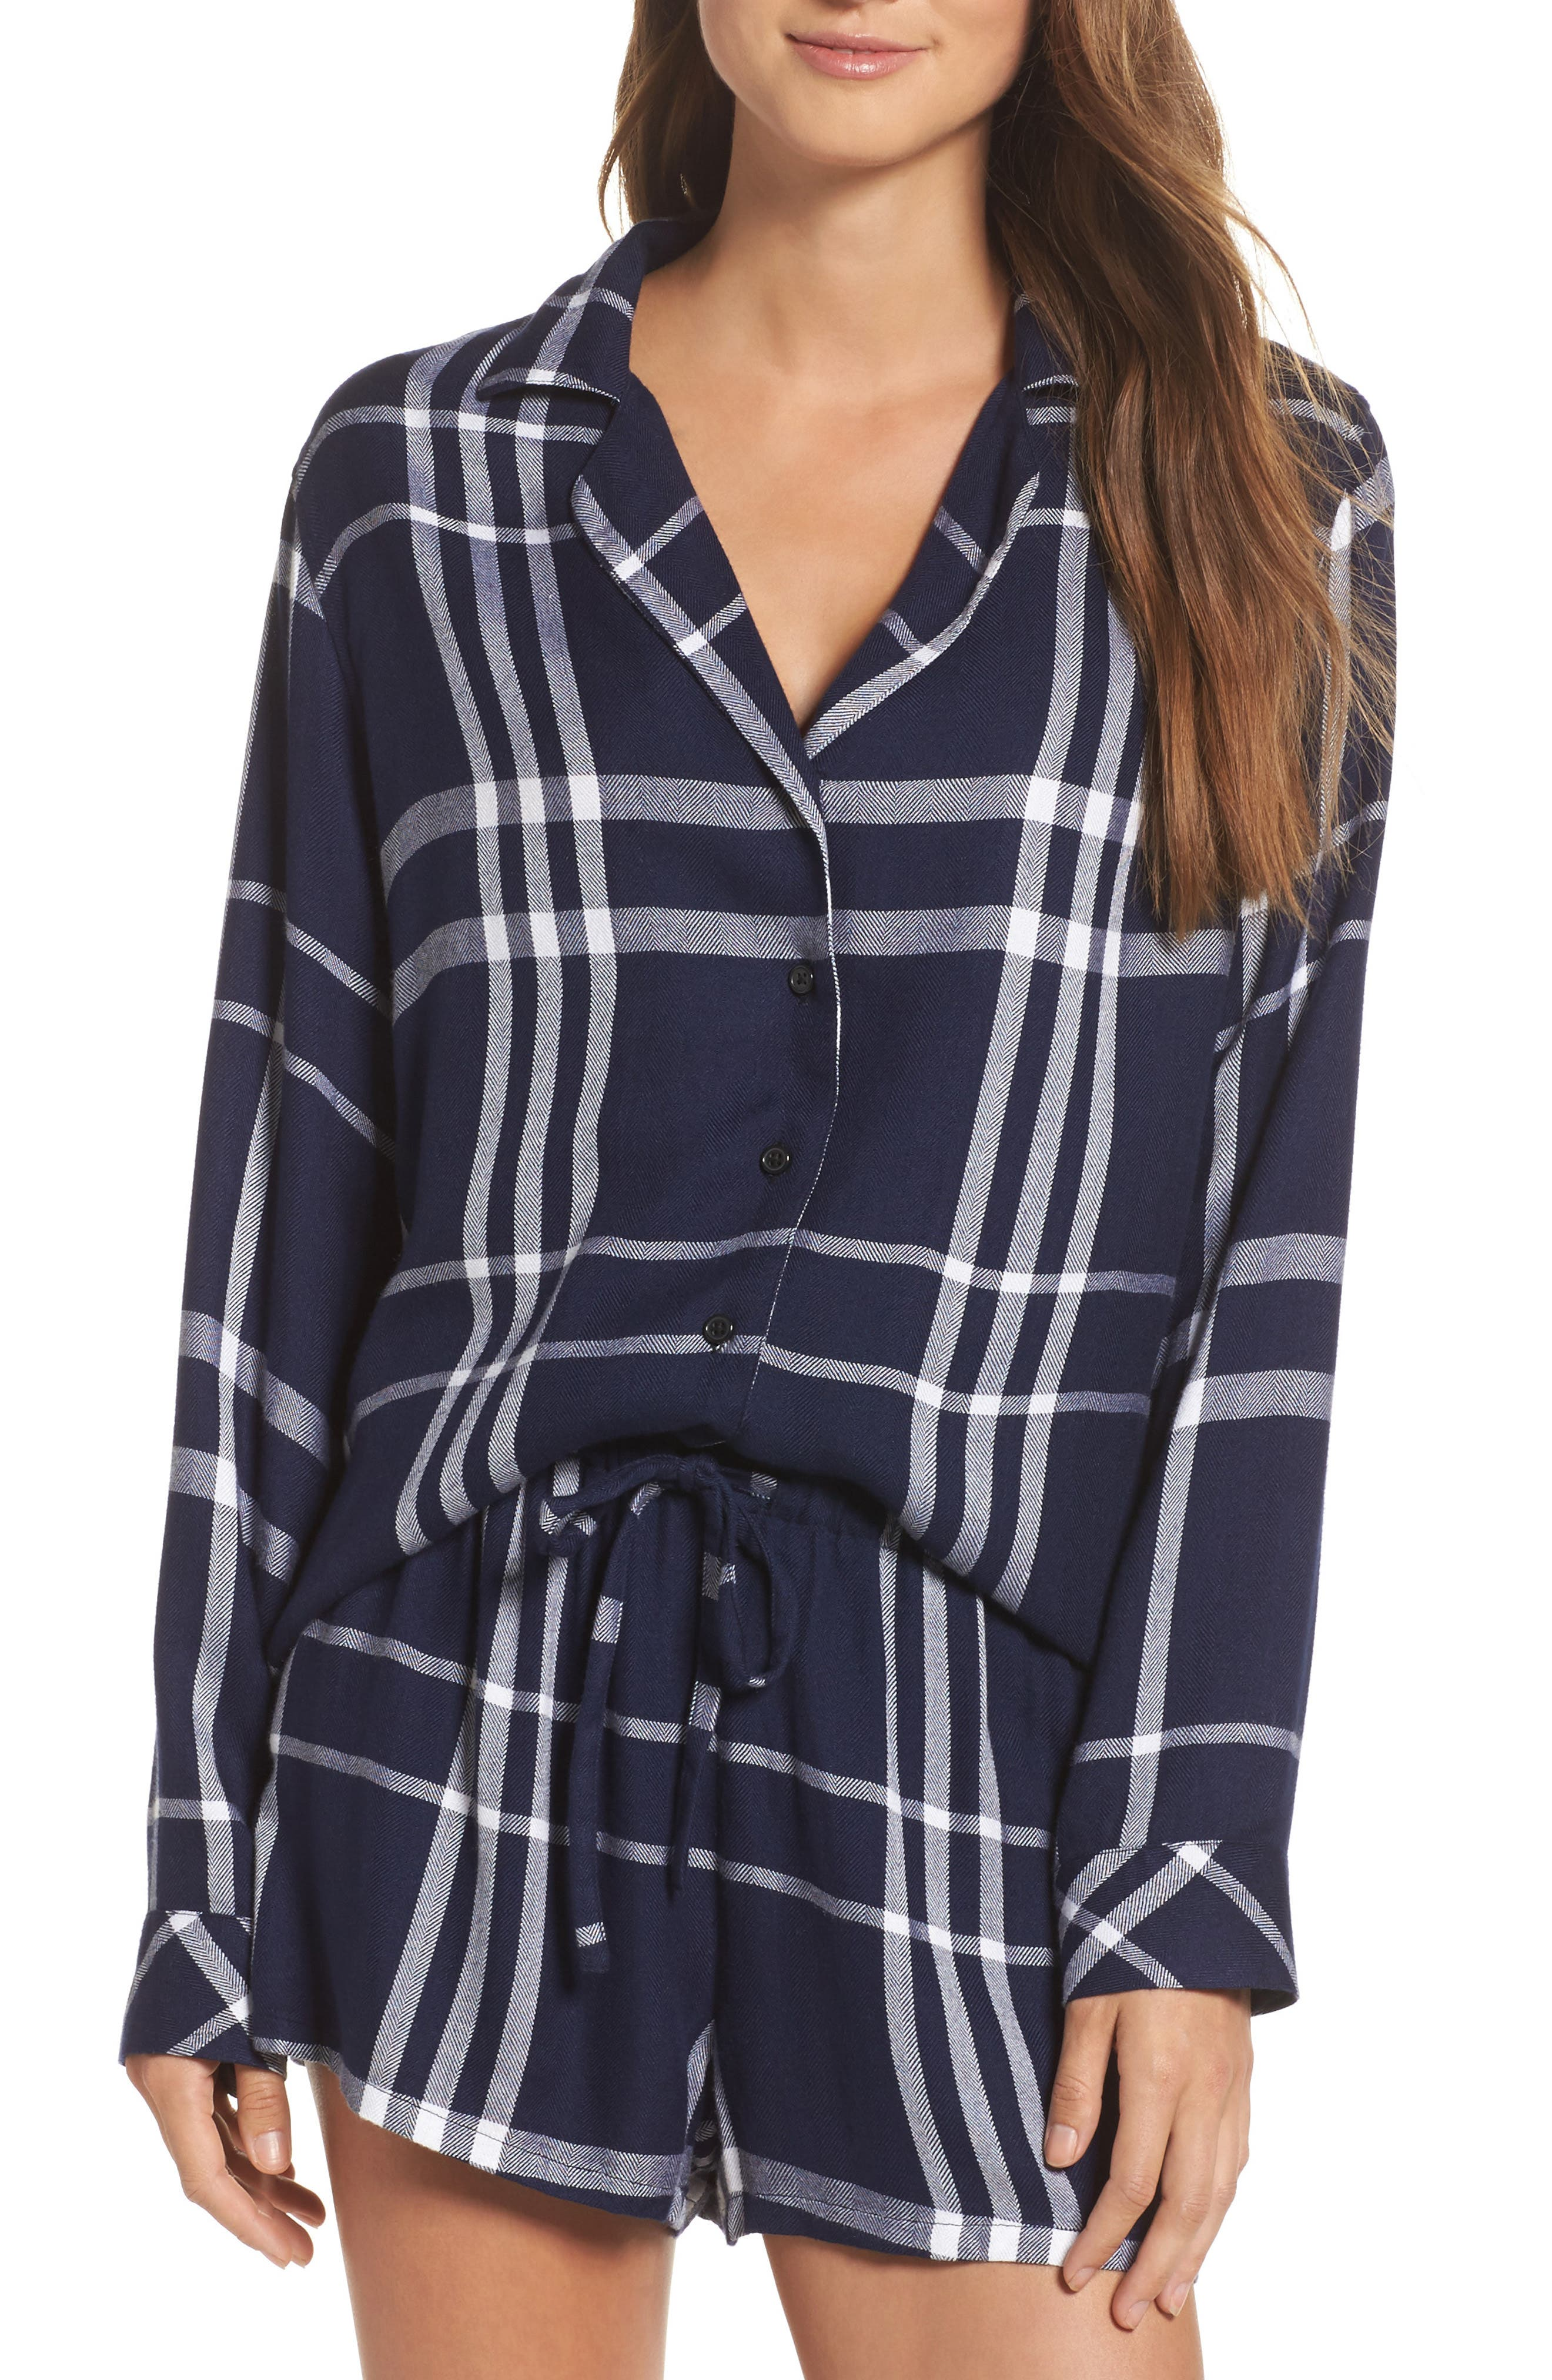 Plaid Short Pajamas,                             Main thumbnail 1, color,                             Cadet/ White